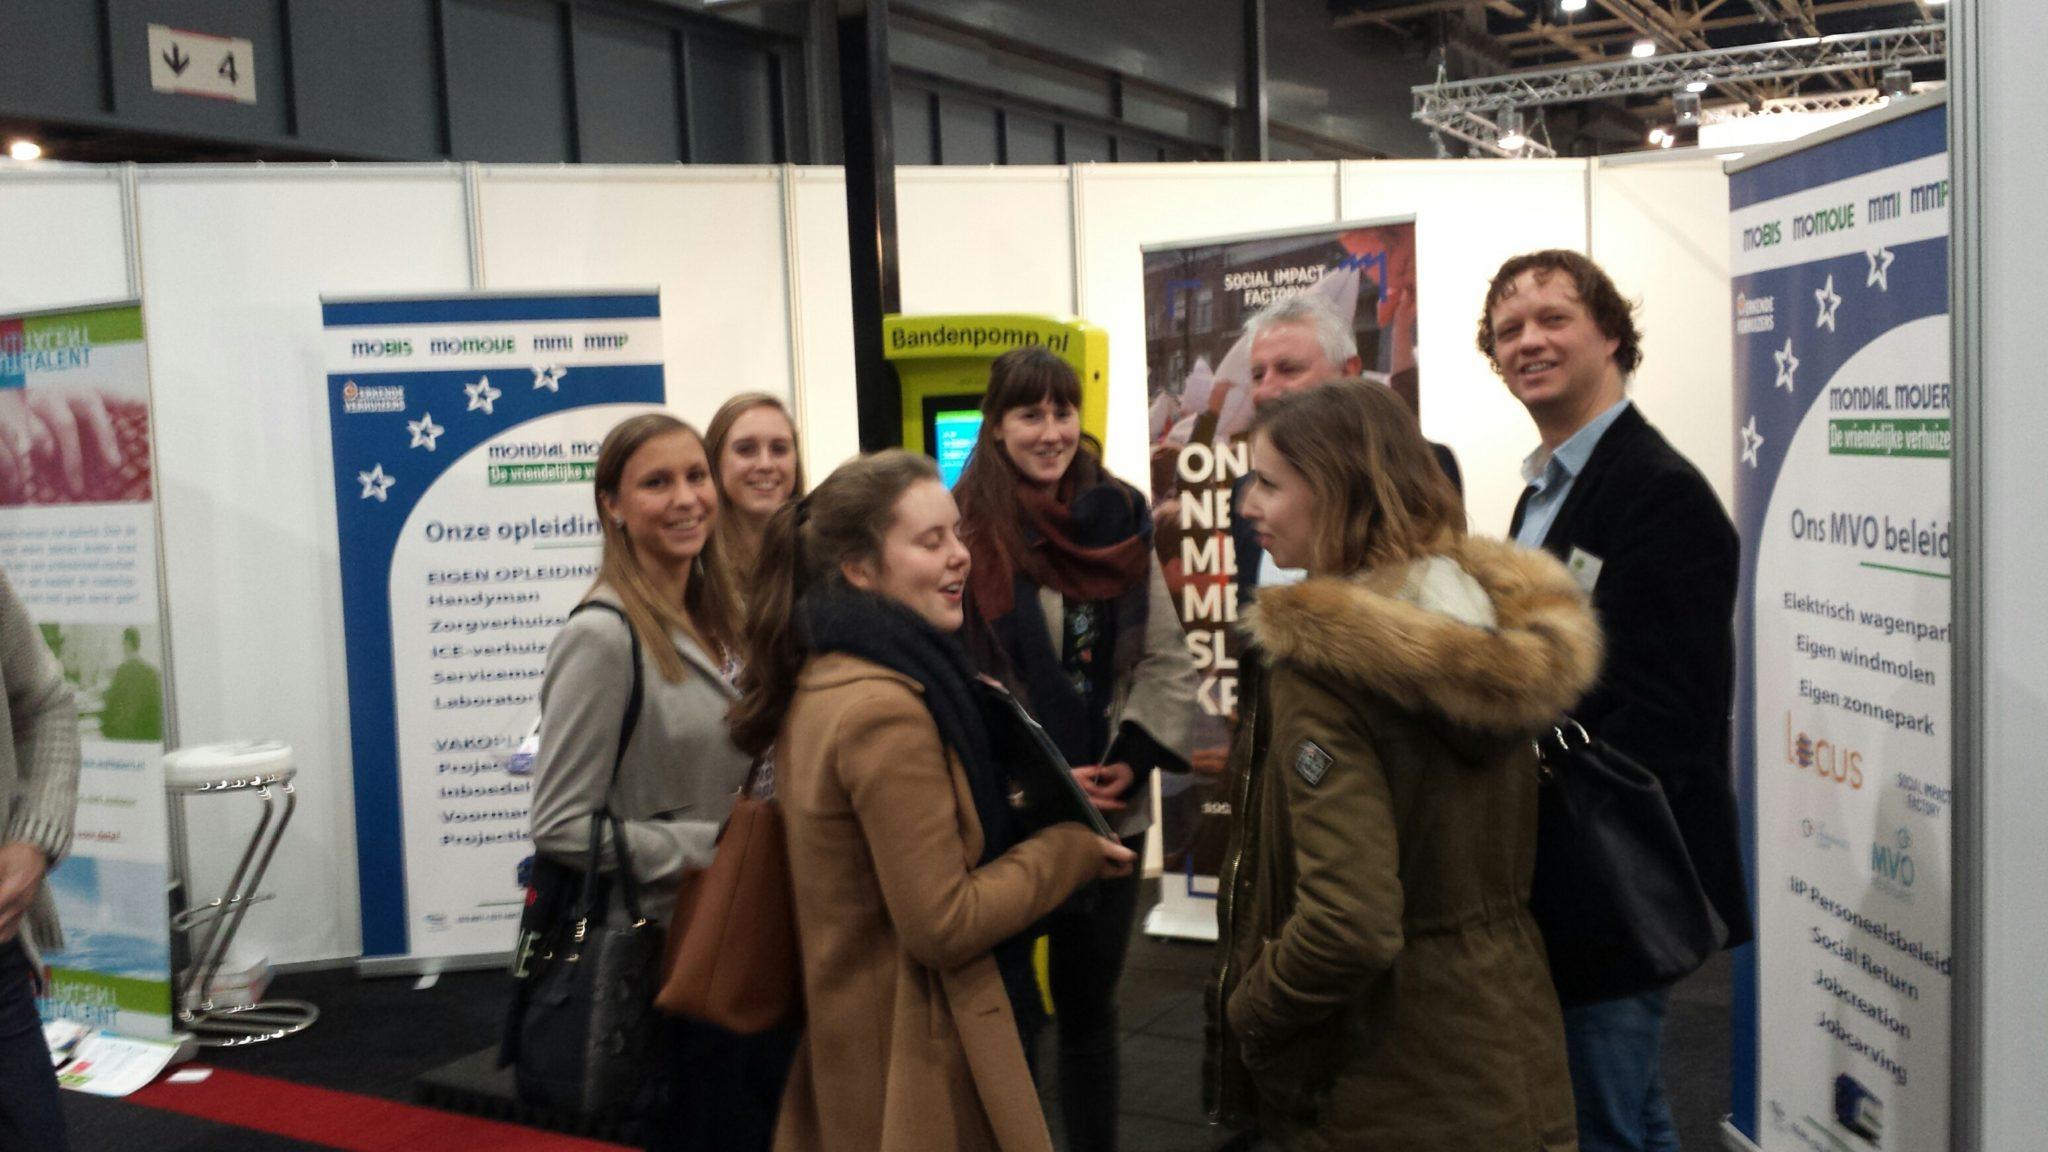 Vakbeurs Facilitair Utrecht, Mondial Movers